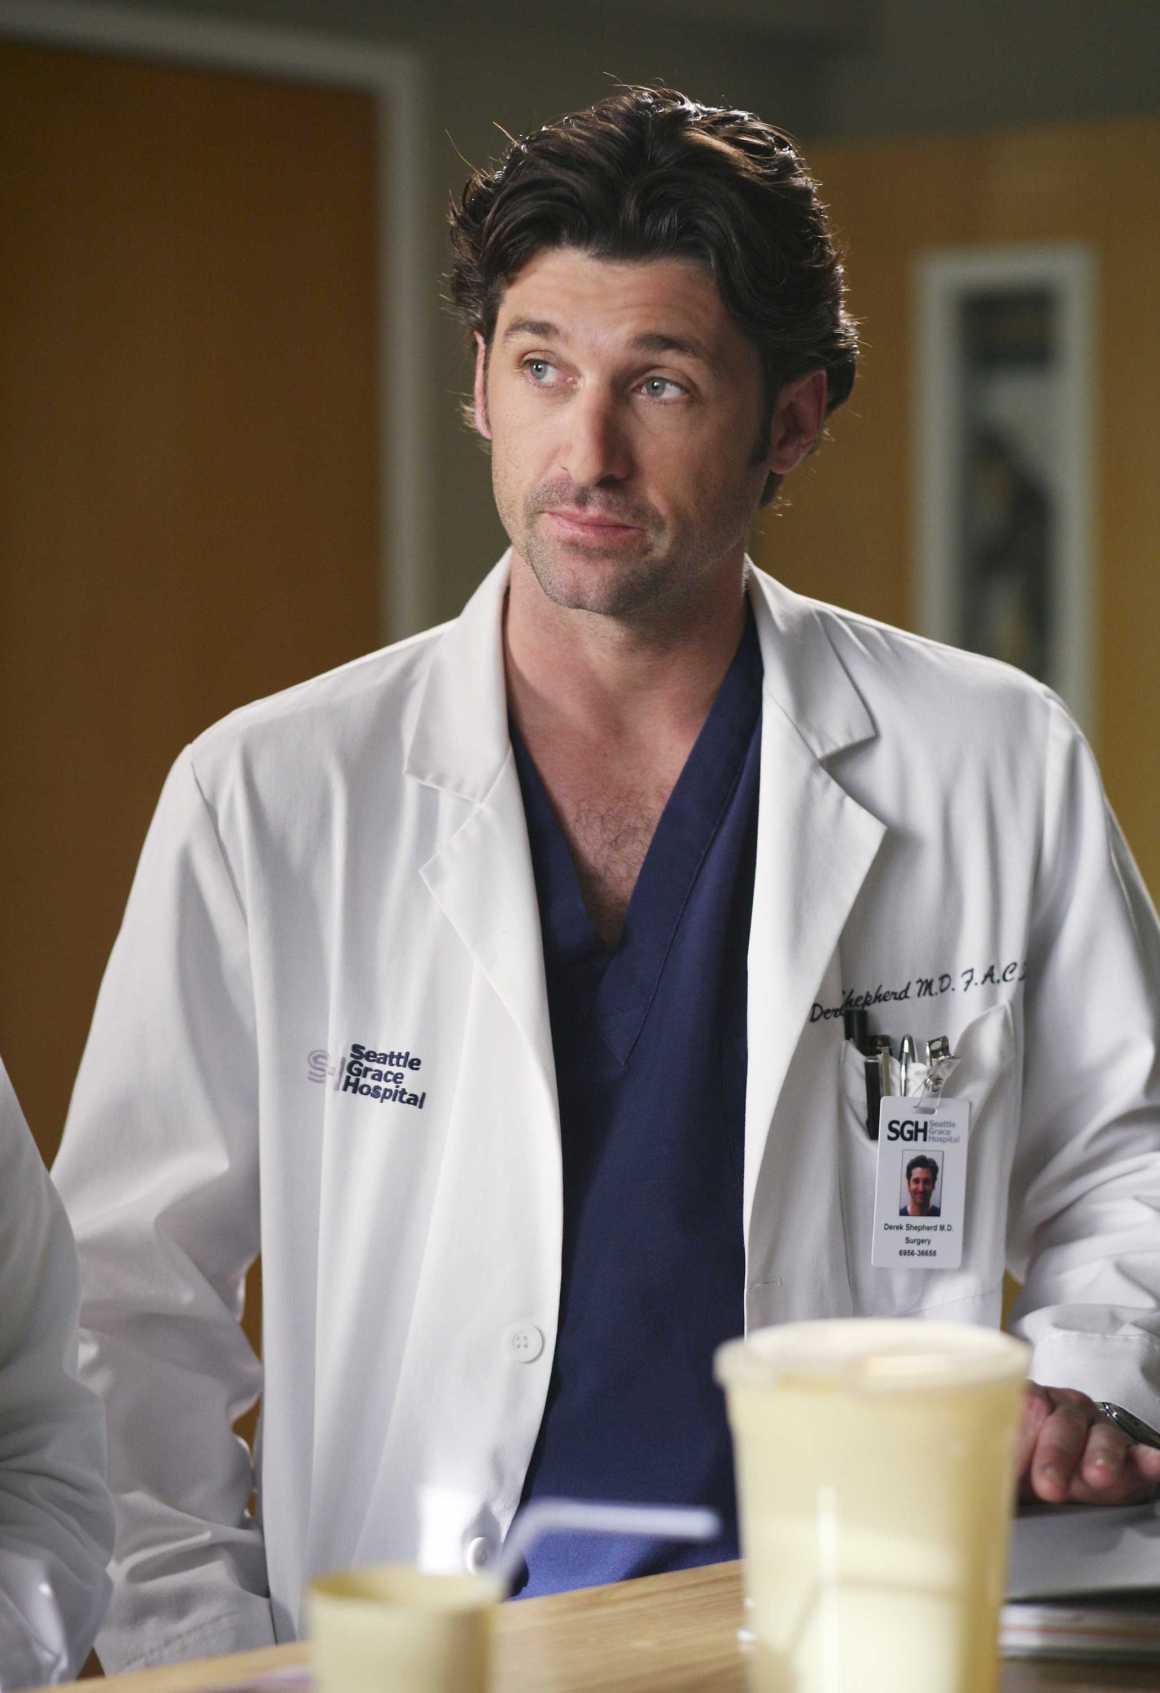 Grey's Anatomy goes down hill